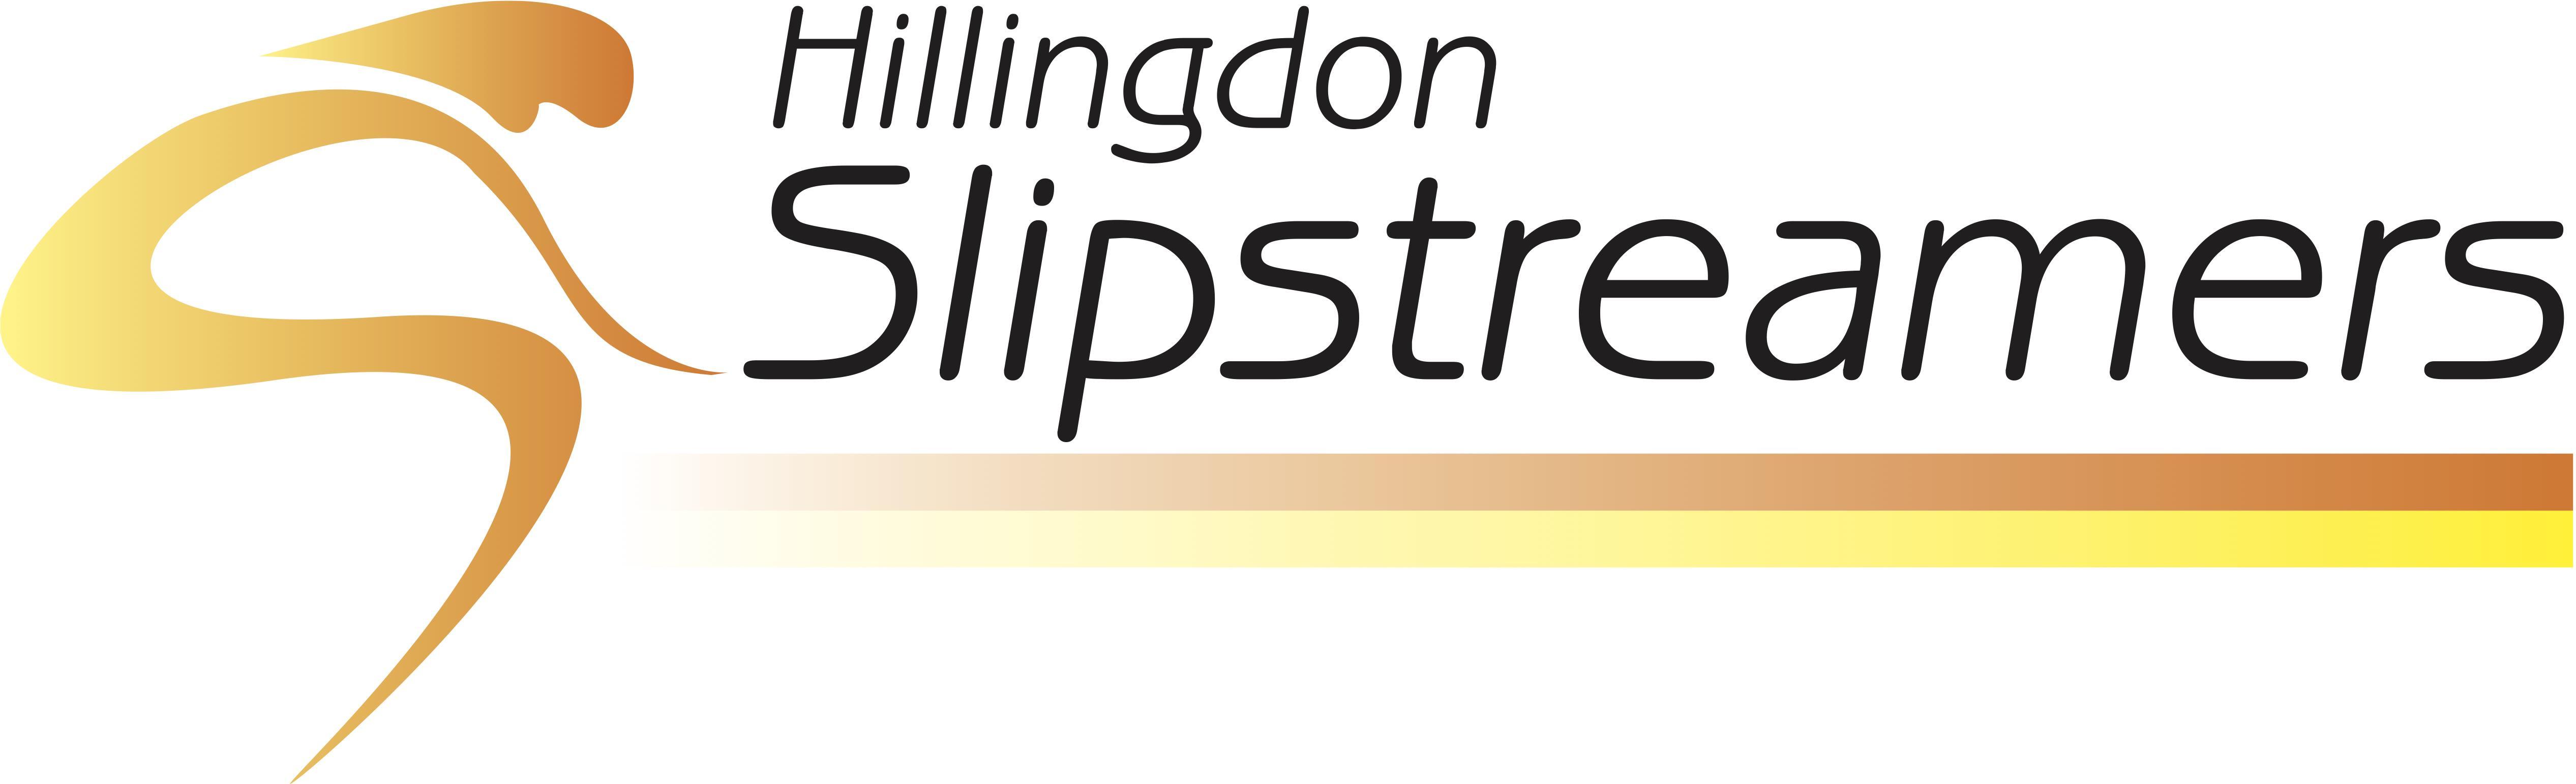 Hillingdon Slipstreamers Logo ()